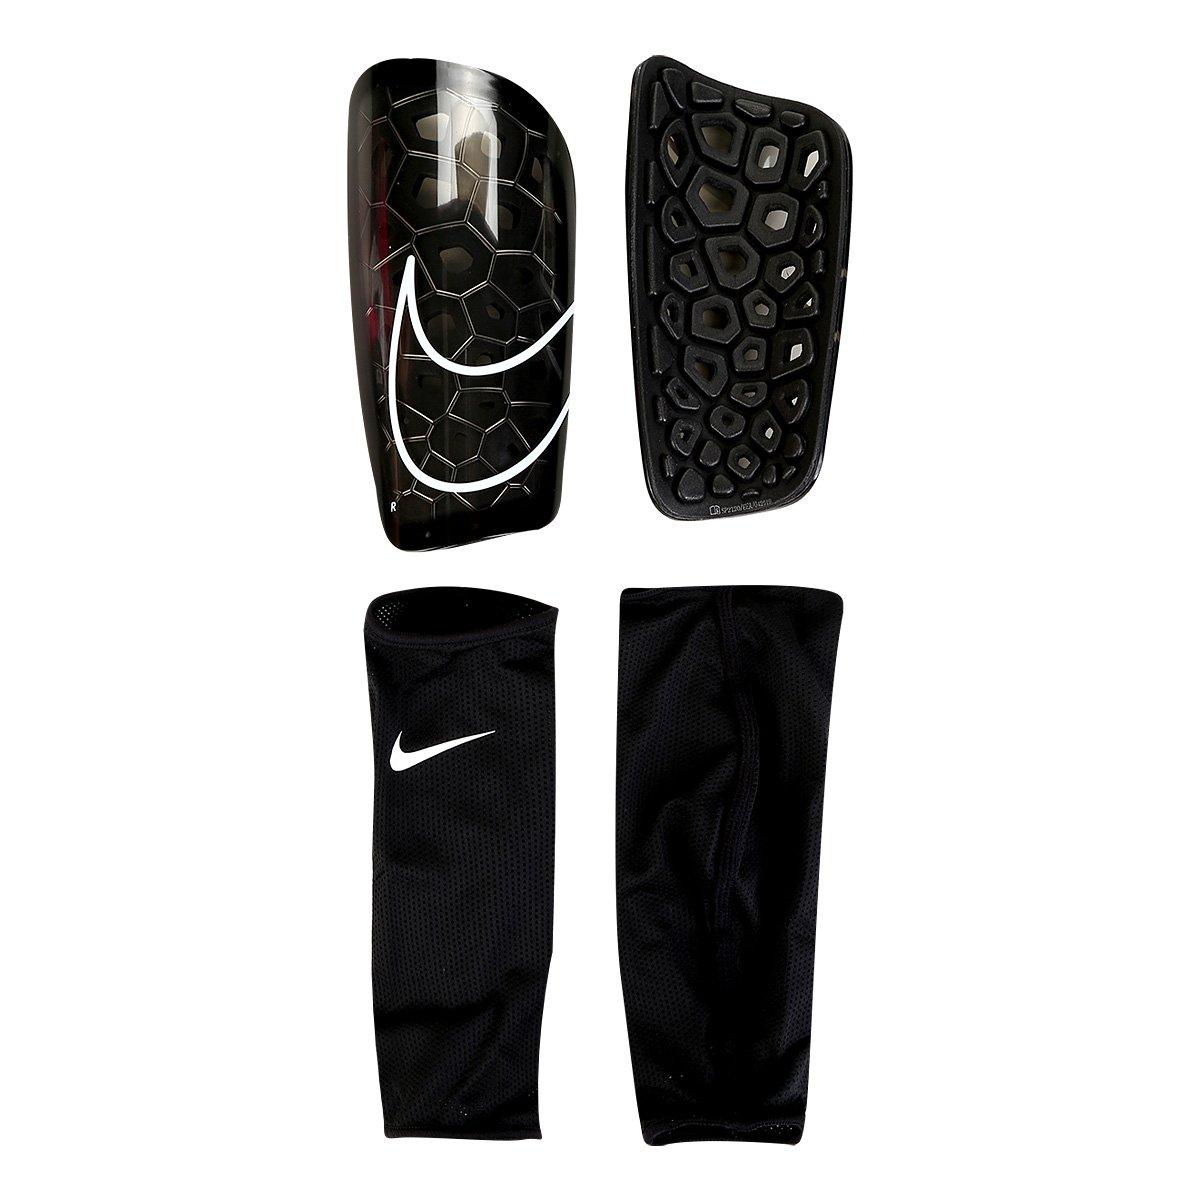 Caneleira Nike Mercurial Lite GRD c/ Malha